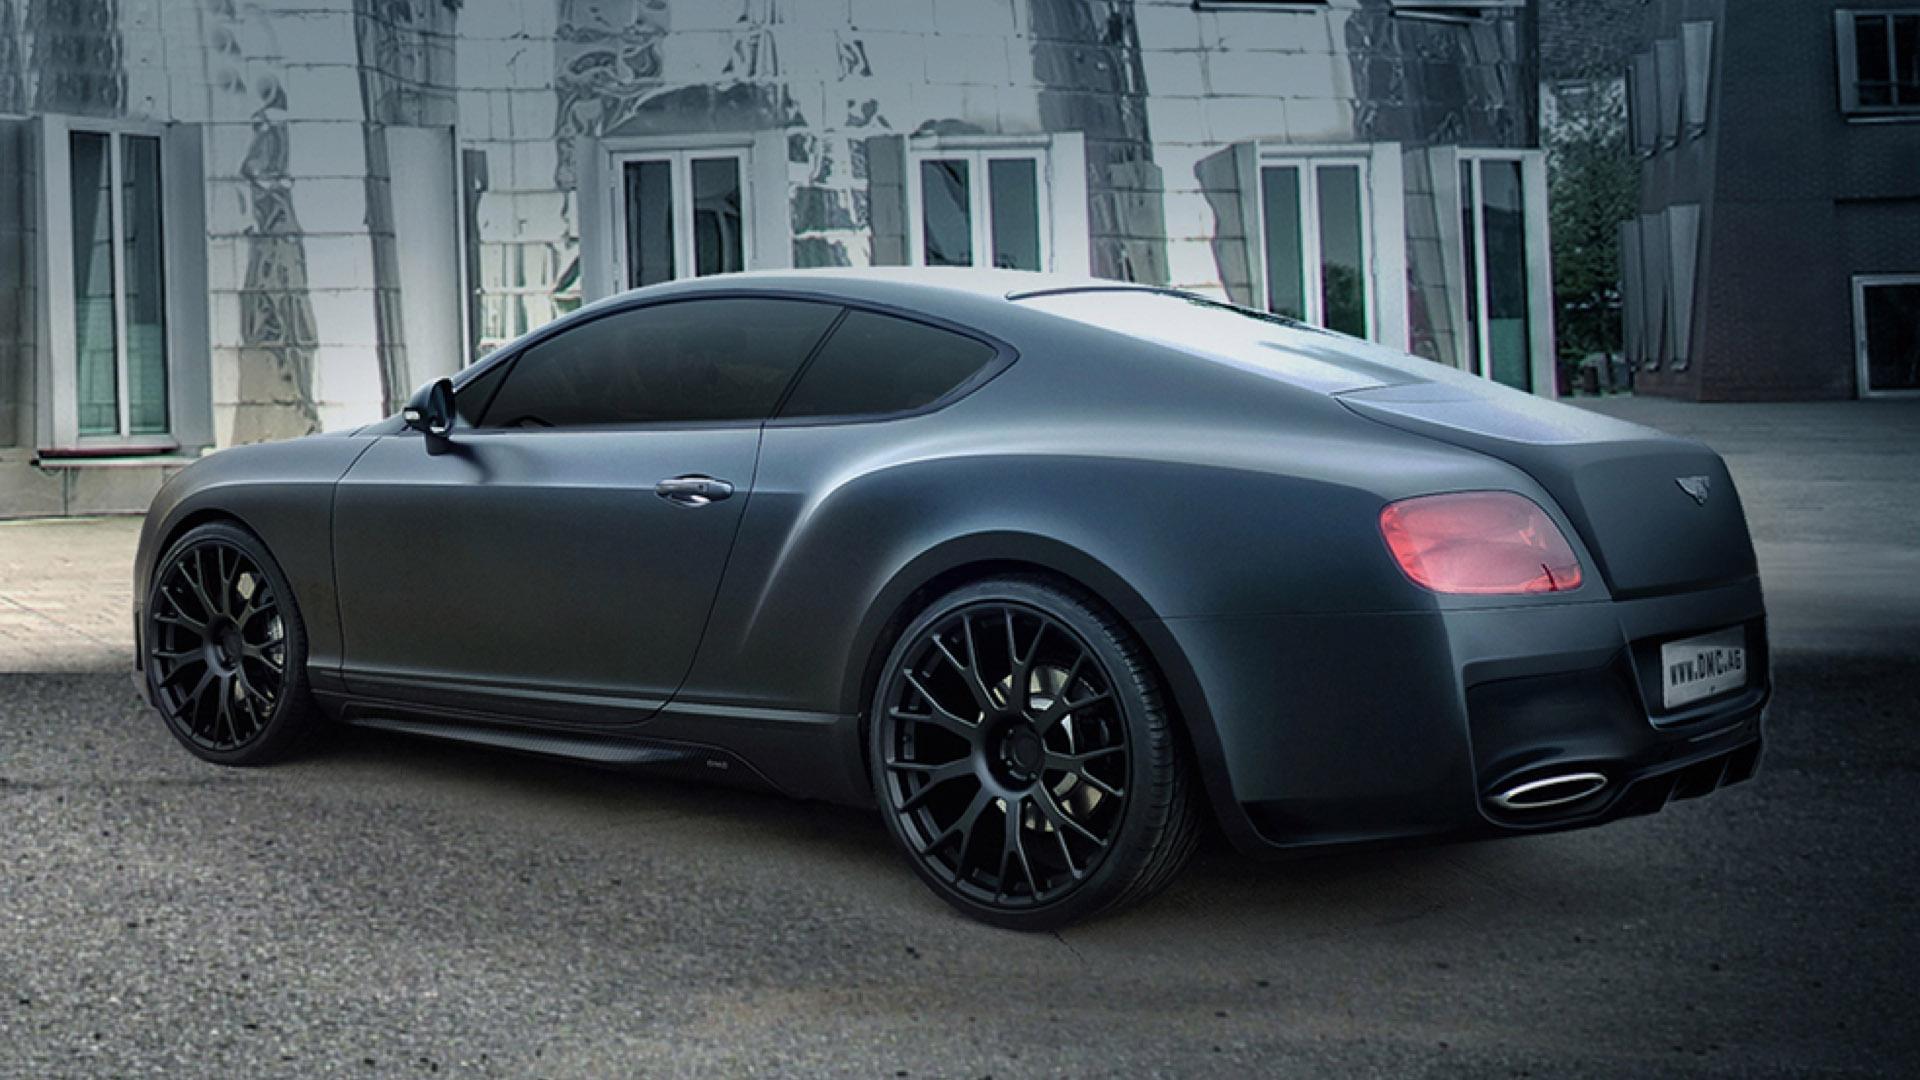 2014 Dmc Bentley Continental Gt Duro China Edition Dark Cars Wallpapers